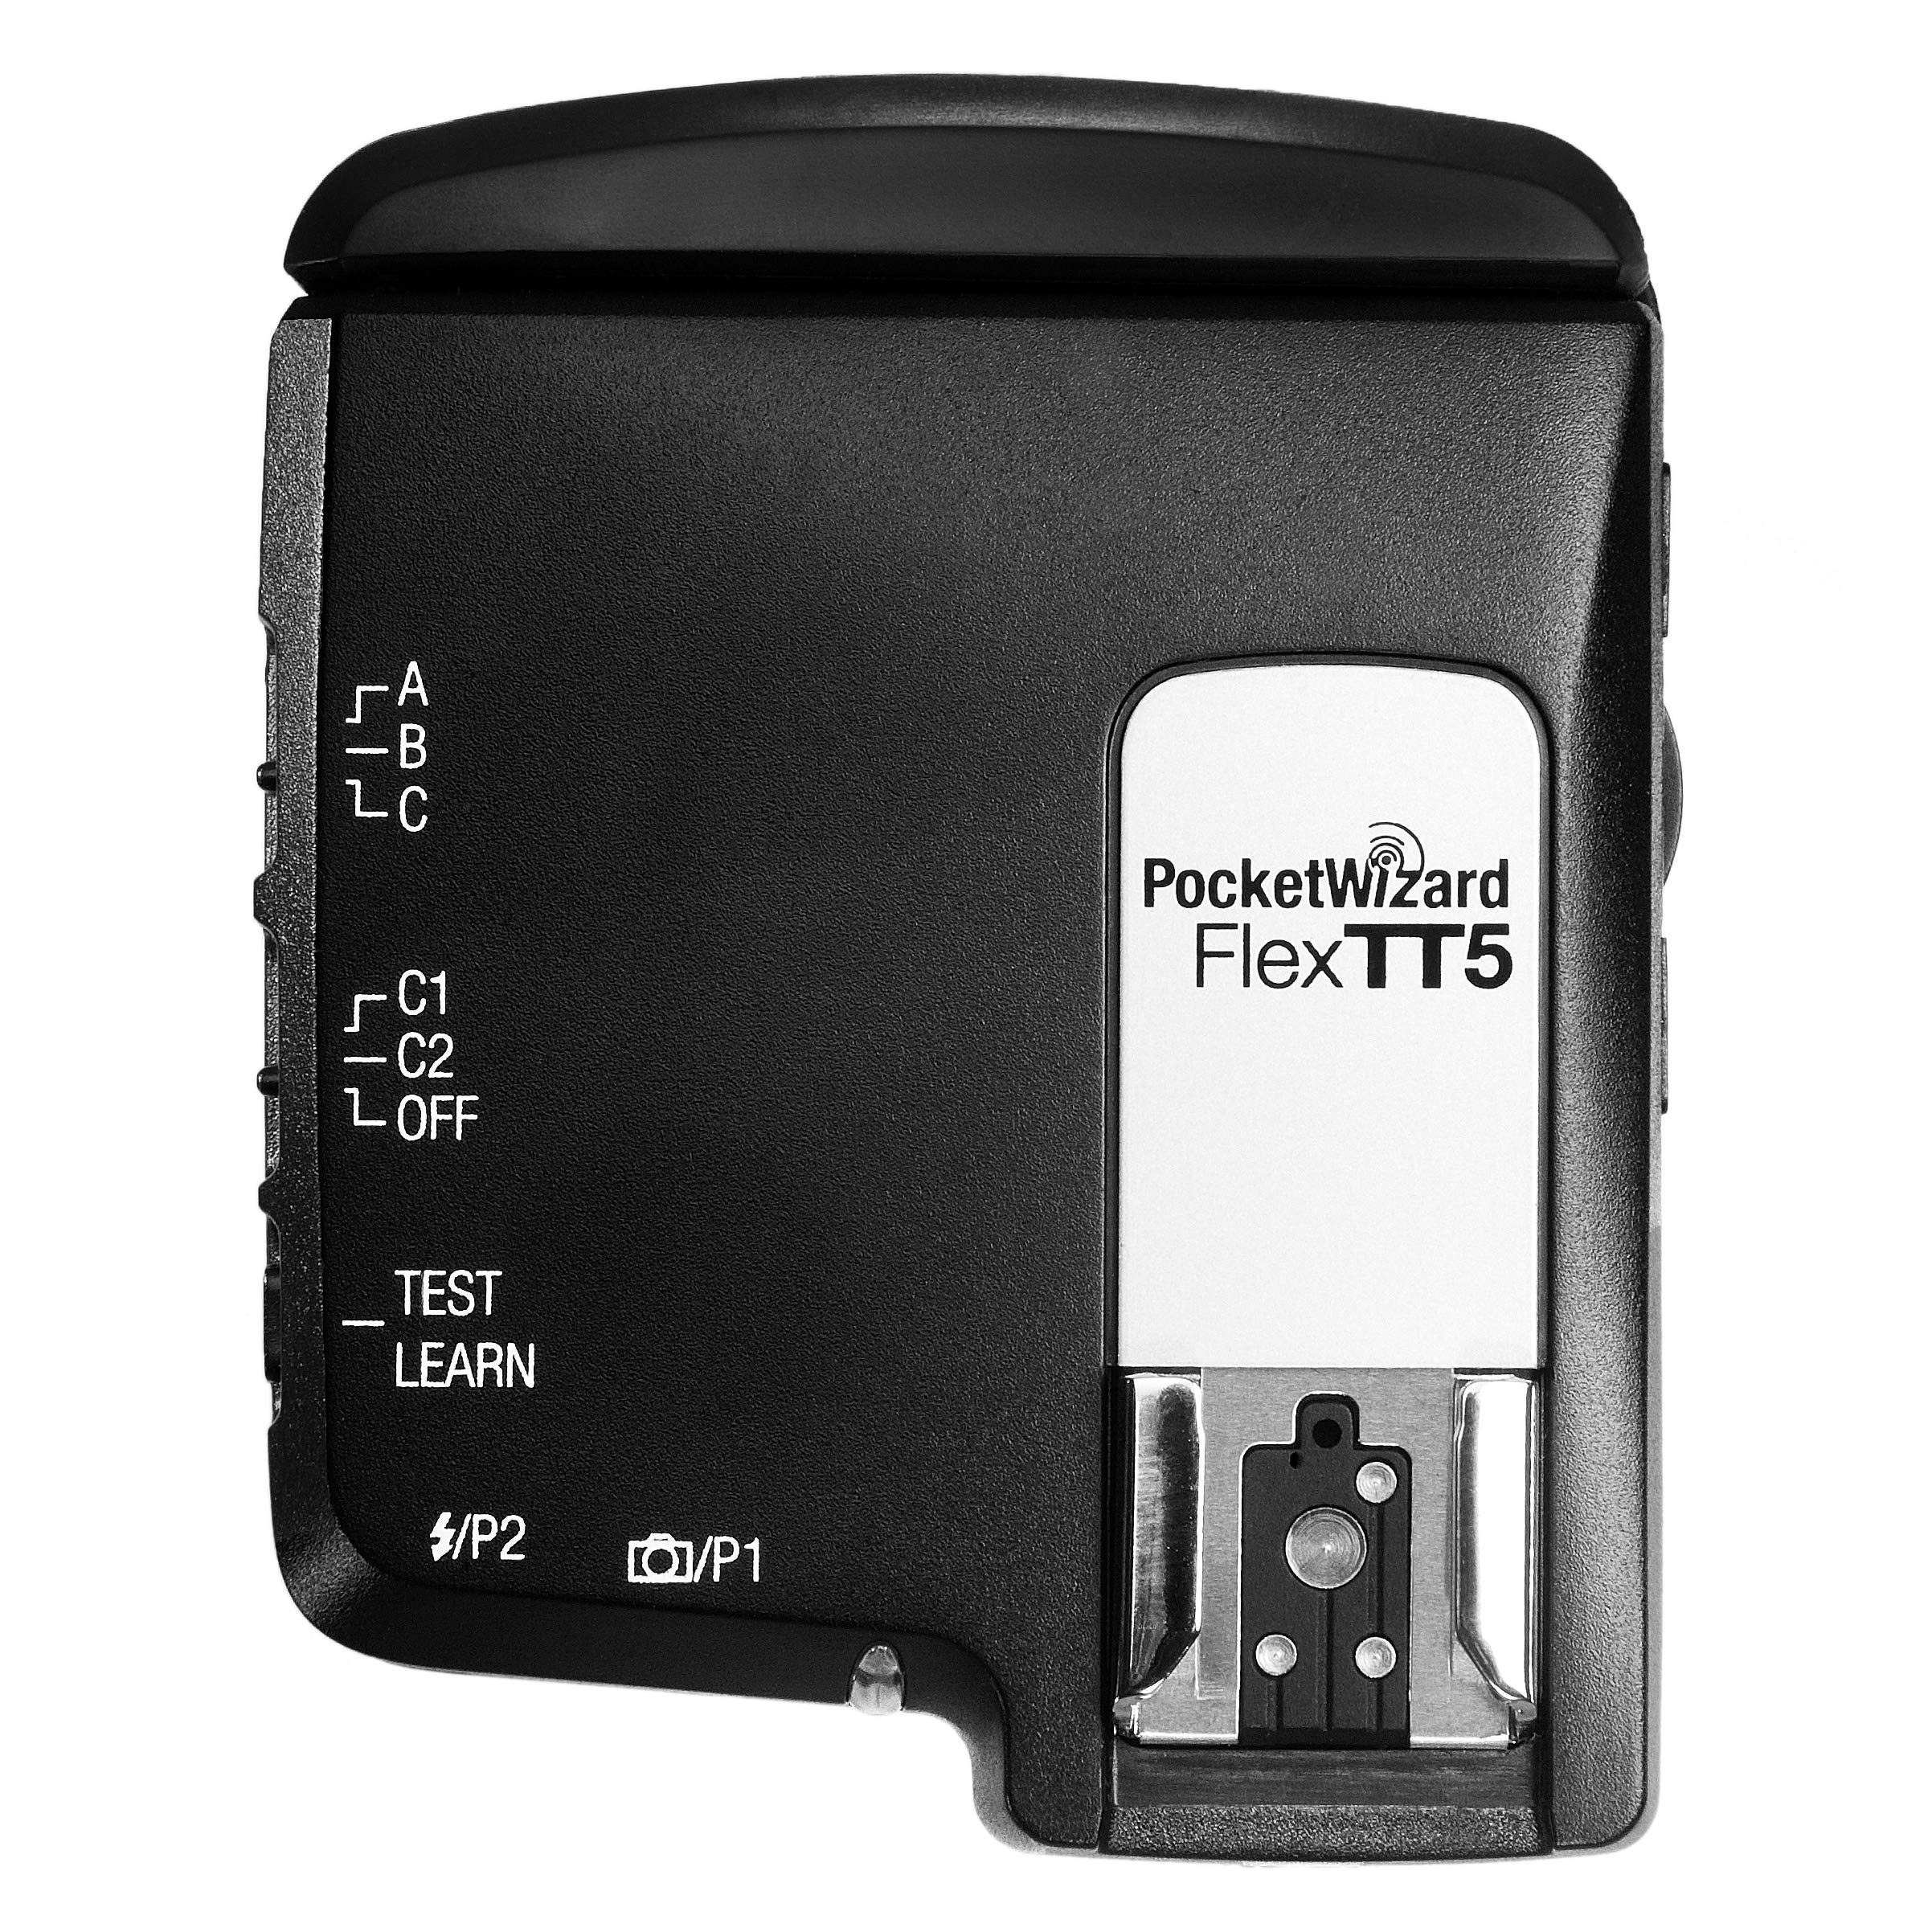 PocketWizard FlexTT5 Transceiver Replacement Hot Shoe Foot Module for Nikon Camera by PocketWizard